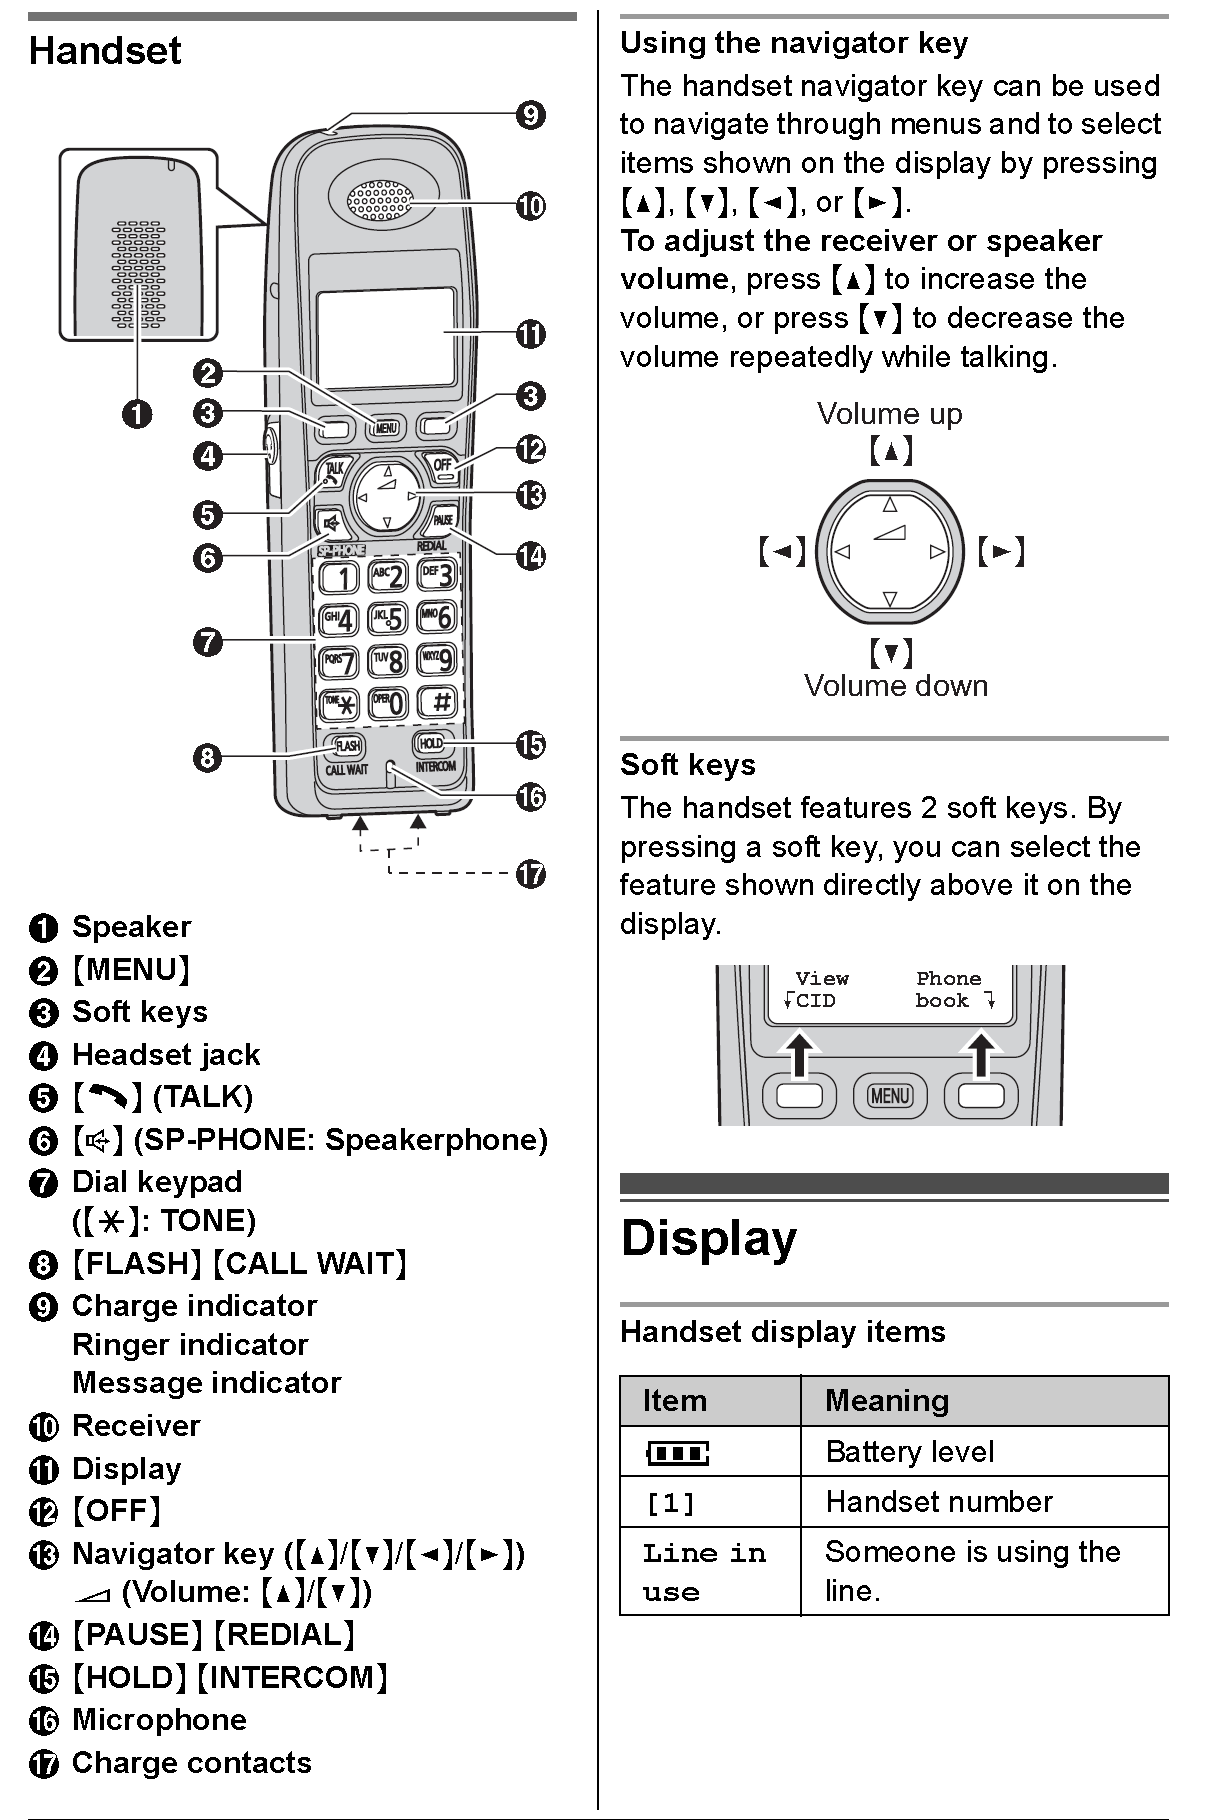 b09bd9c3-96b7-4e60-a0fc-e7f2638ff4c7_9331-HandsetKeys.png